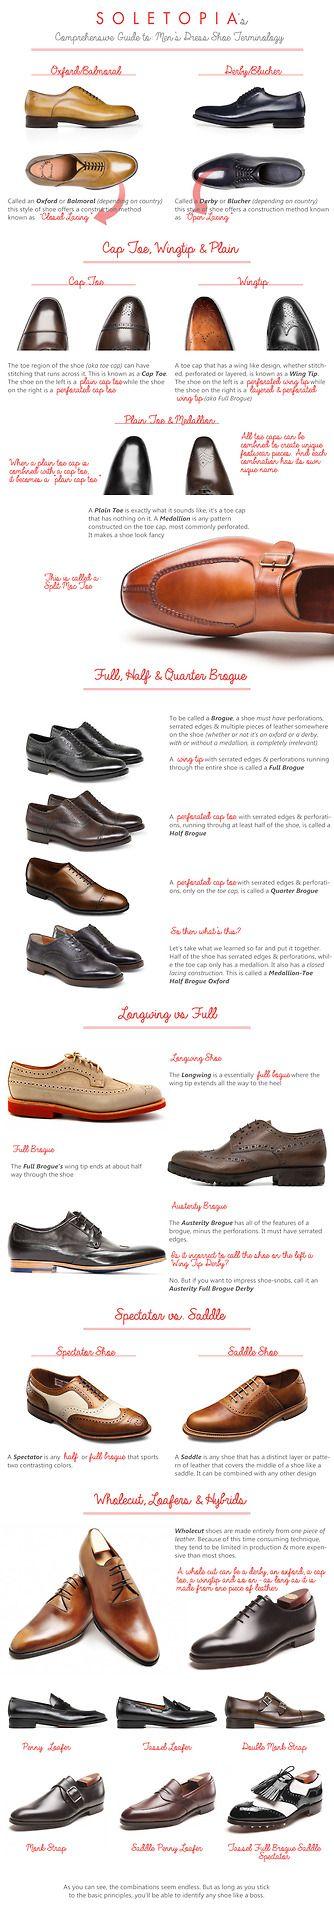 .Shoe Guide #Style #Fashion #Menswear Re-pinned by www.avacationrent... alles für Ihren Erfolg - www.ratsucher.de